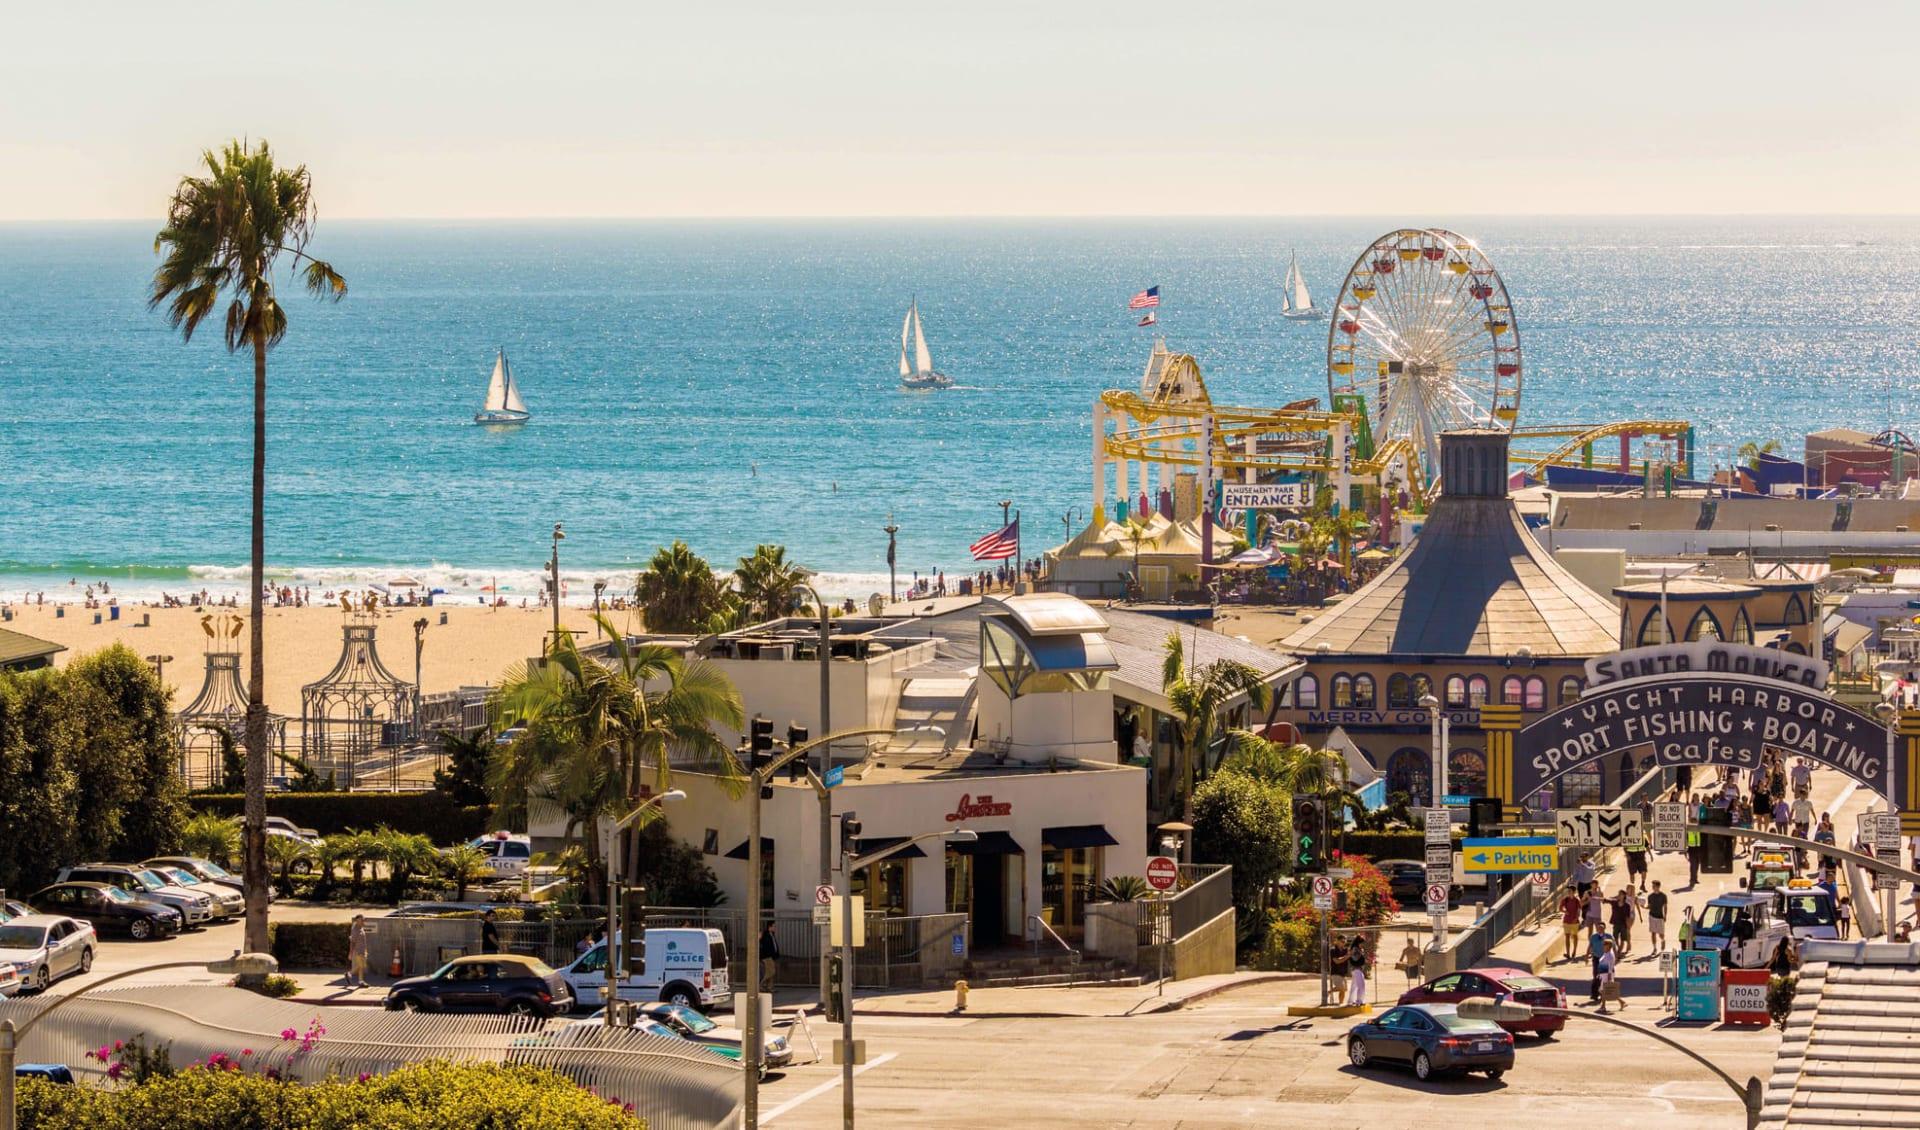 Western Bonanza ab San Francisco: USA - California - Santa Monica